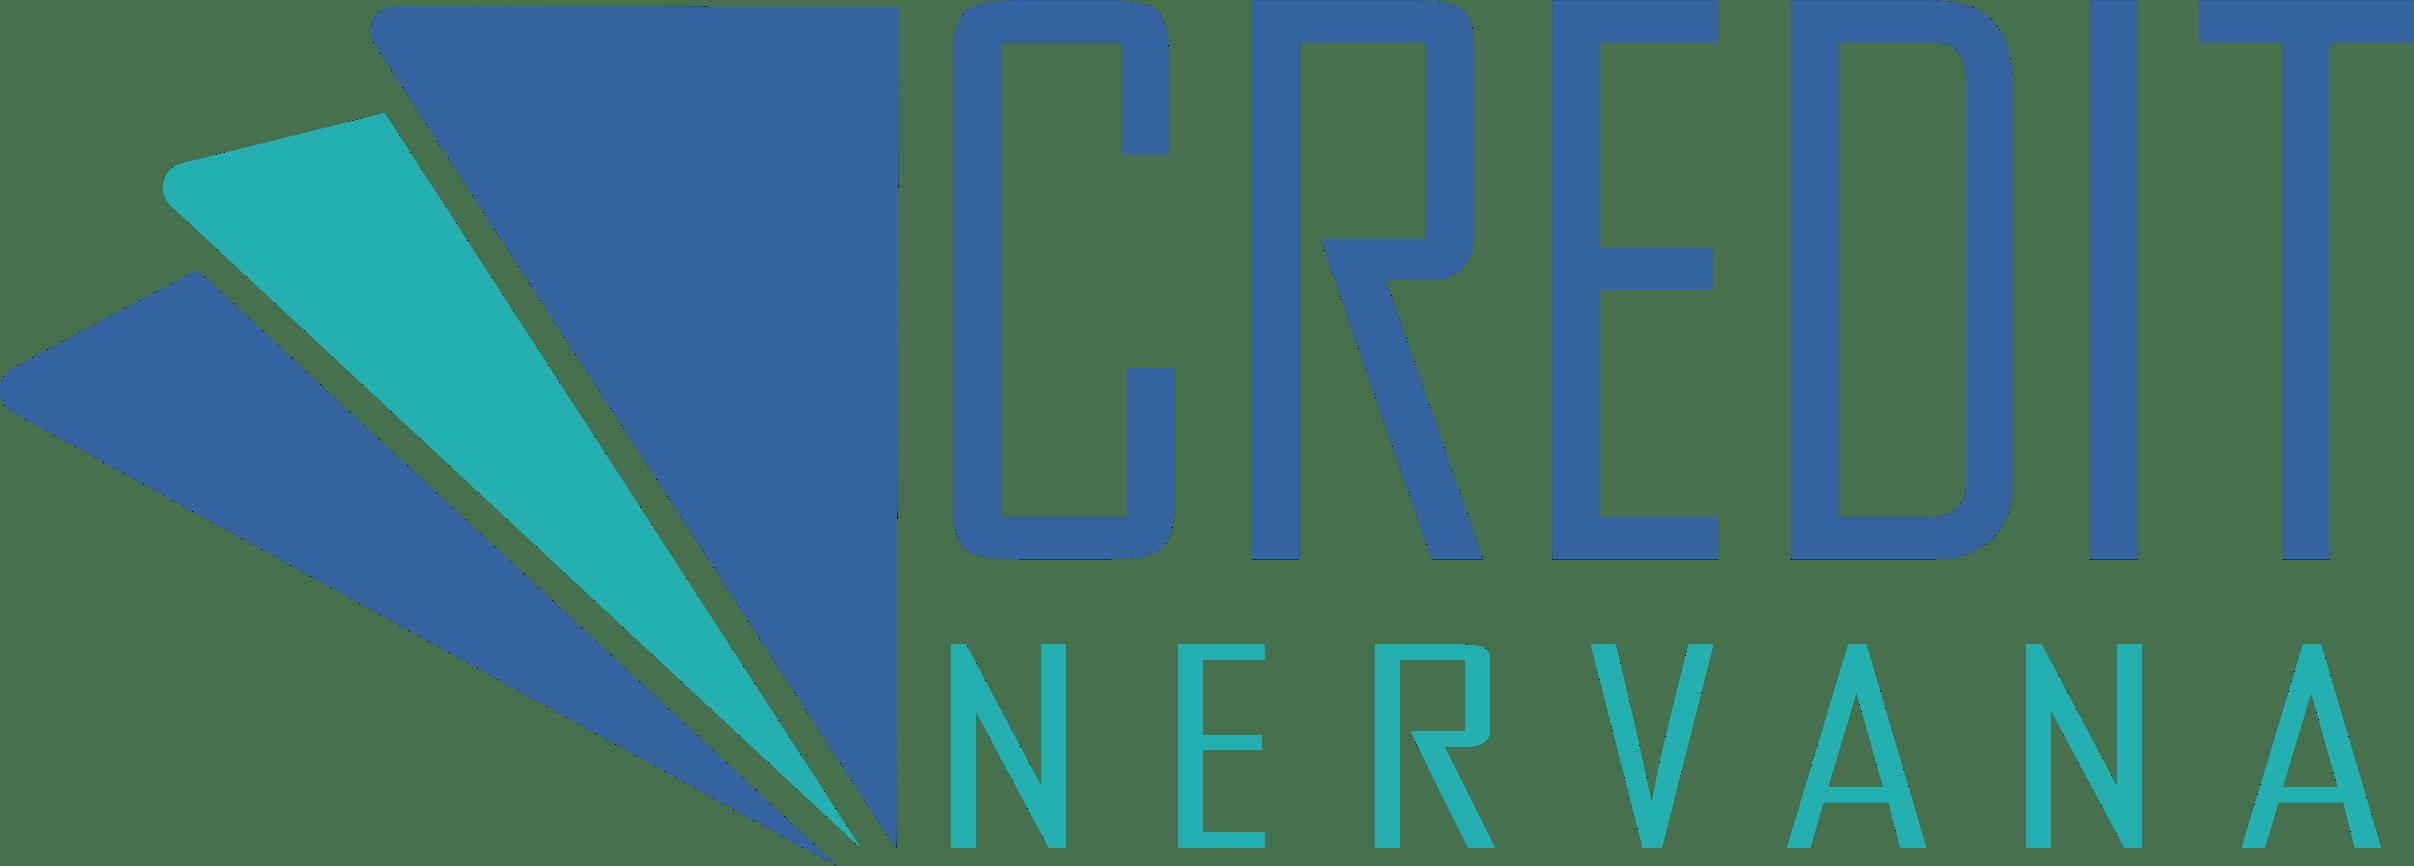 Creditnervana